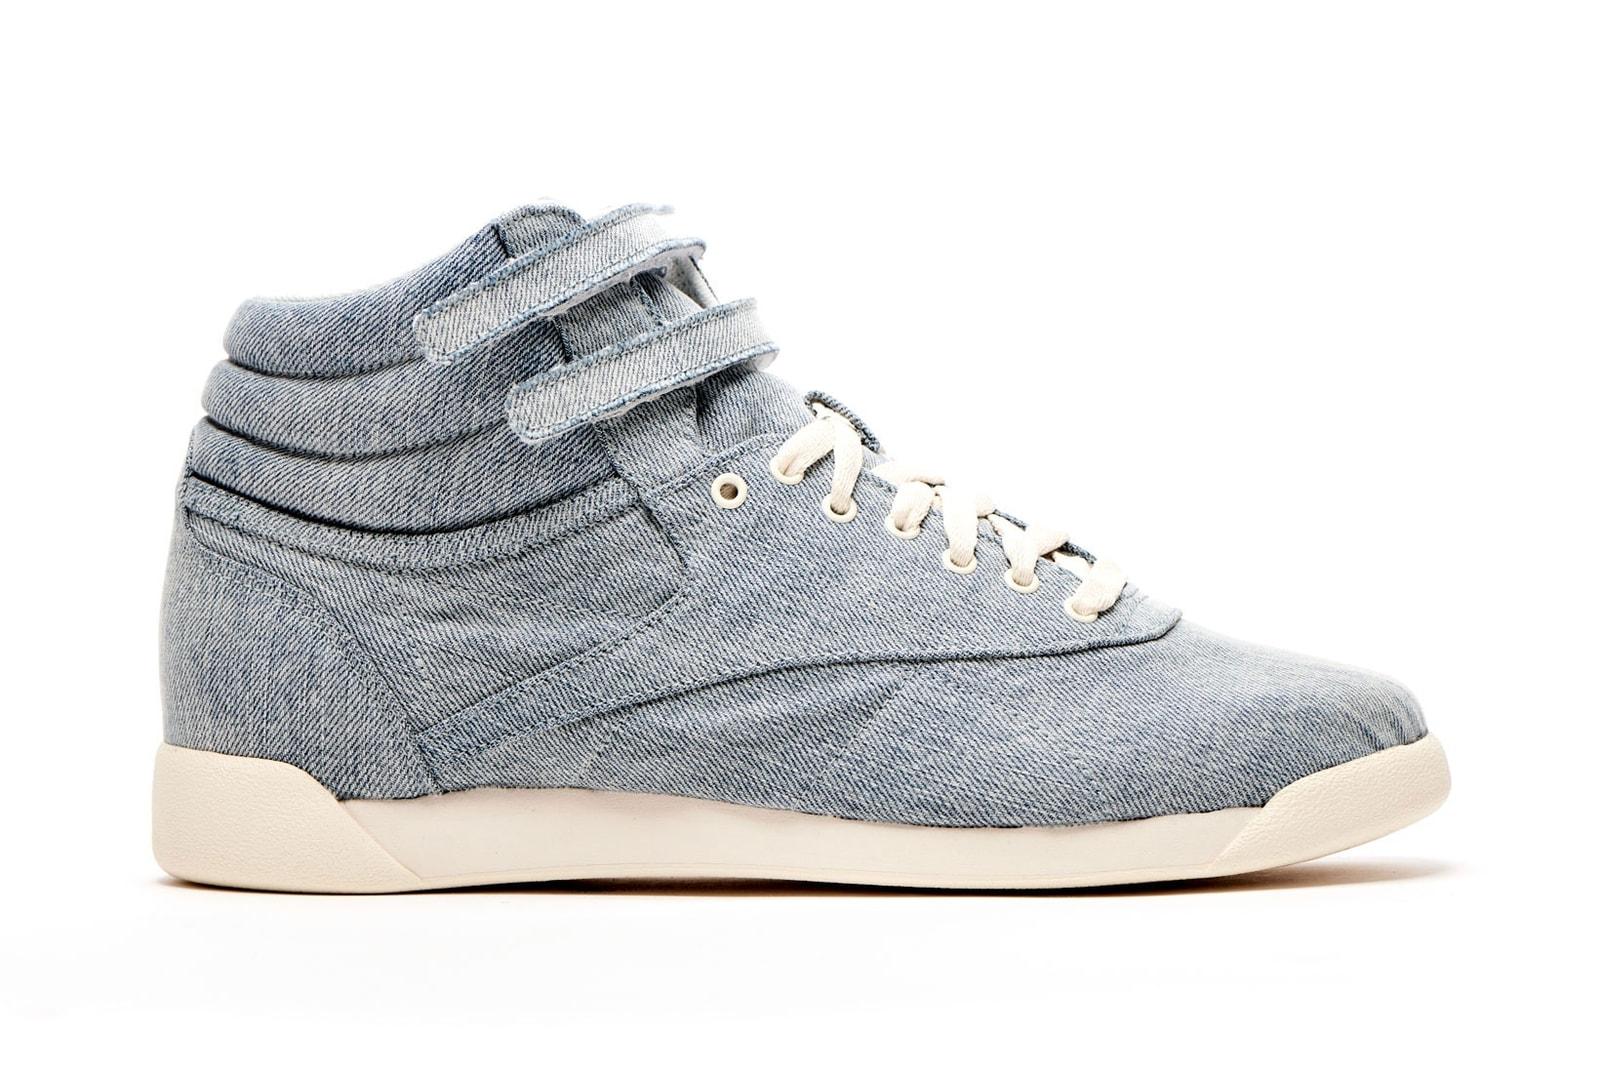 adidas Originals Stitch and Turn Campus Gazelle Release Info Frankie Collective Reworked Supreme Urban Decay Pat Mcgrath Eyeshadow Reebok Jonathan Simkhai Cos Kappa